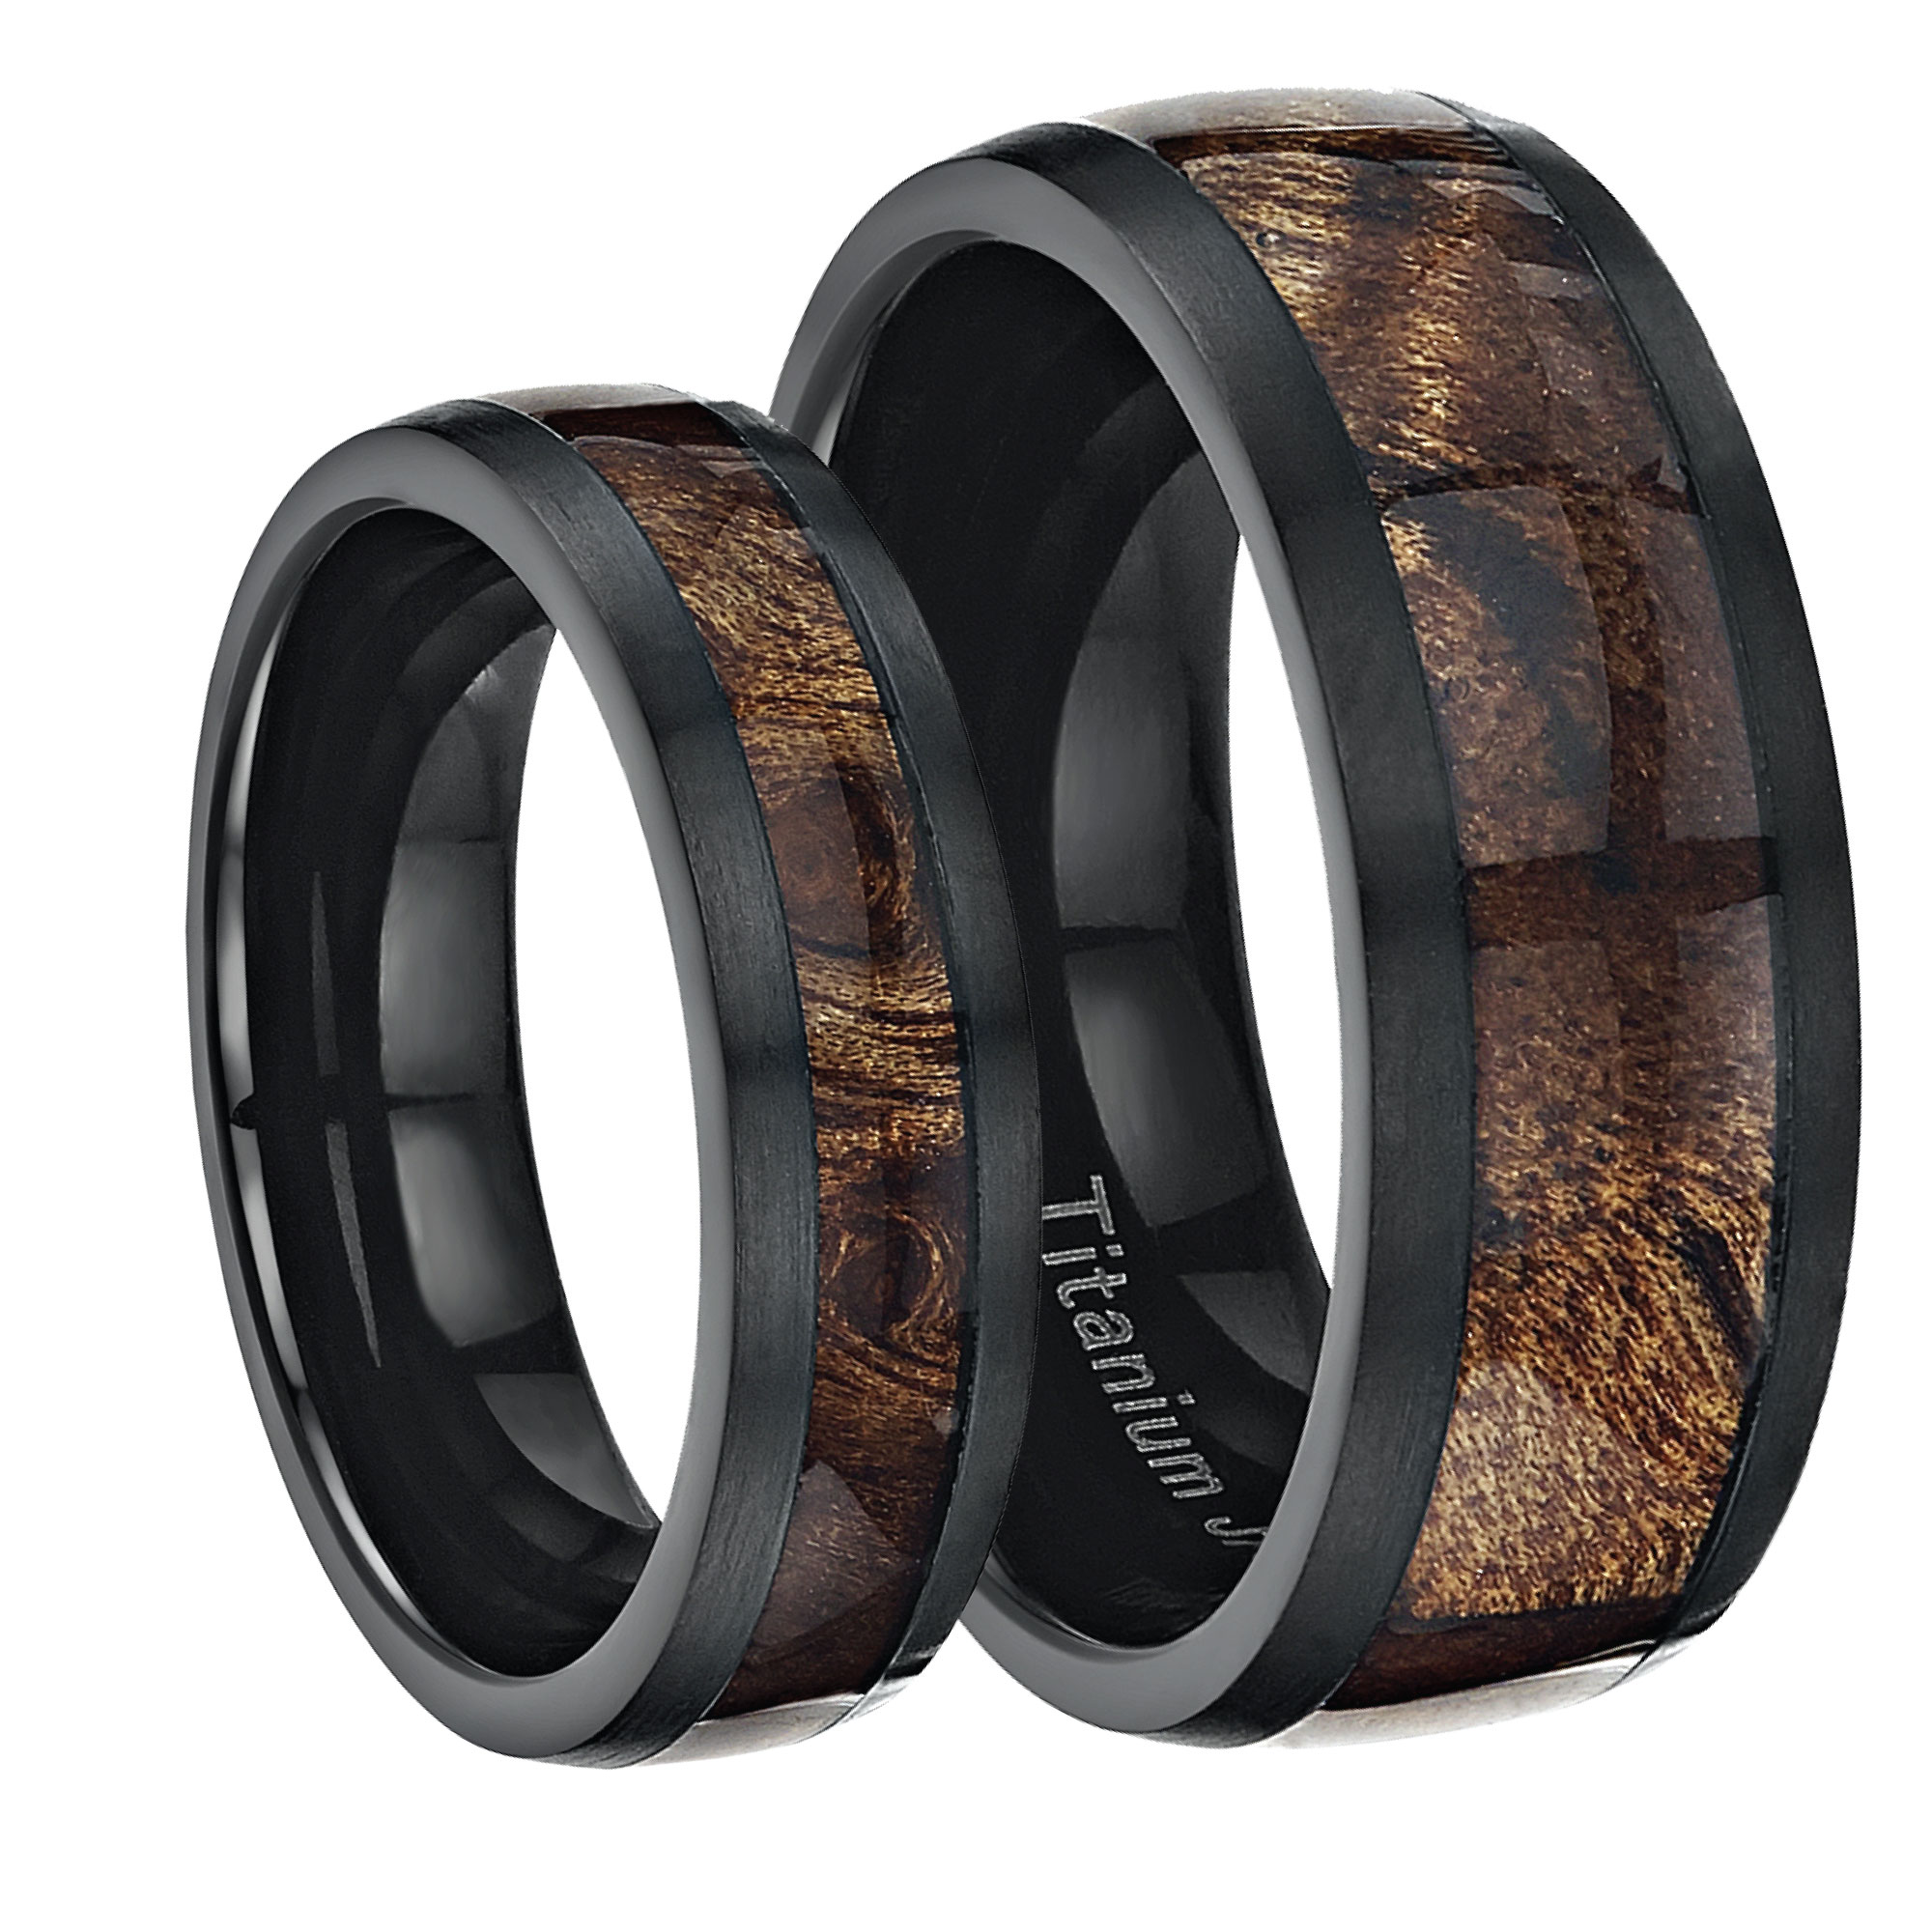 His Amp Hers Black Titanium Wedding Ring Band Set Inlayed